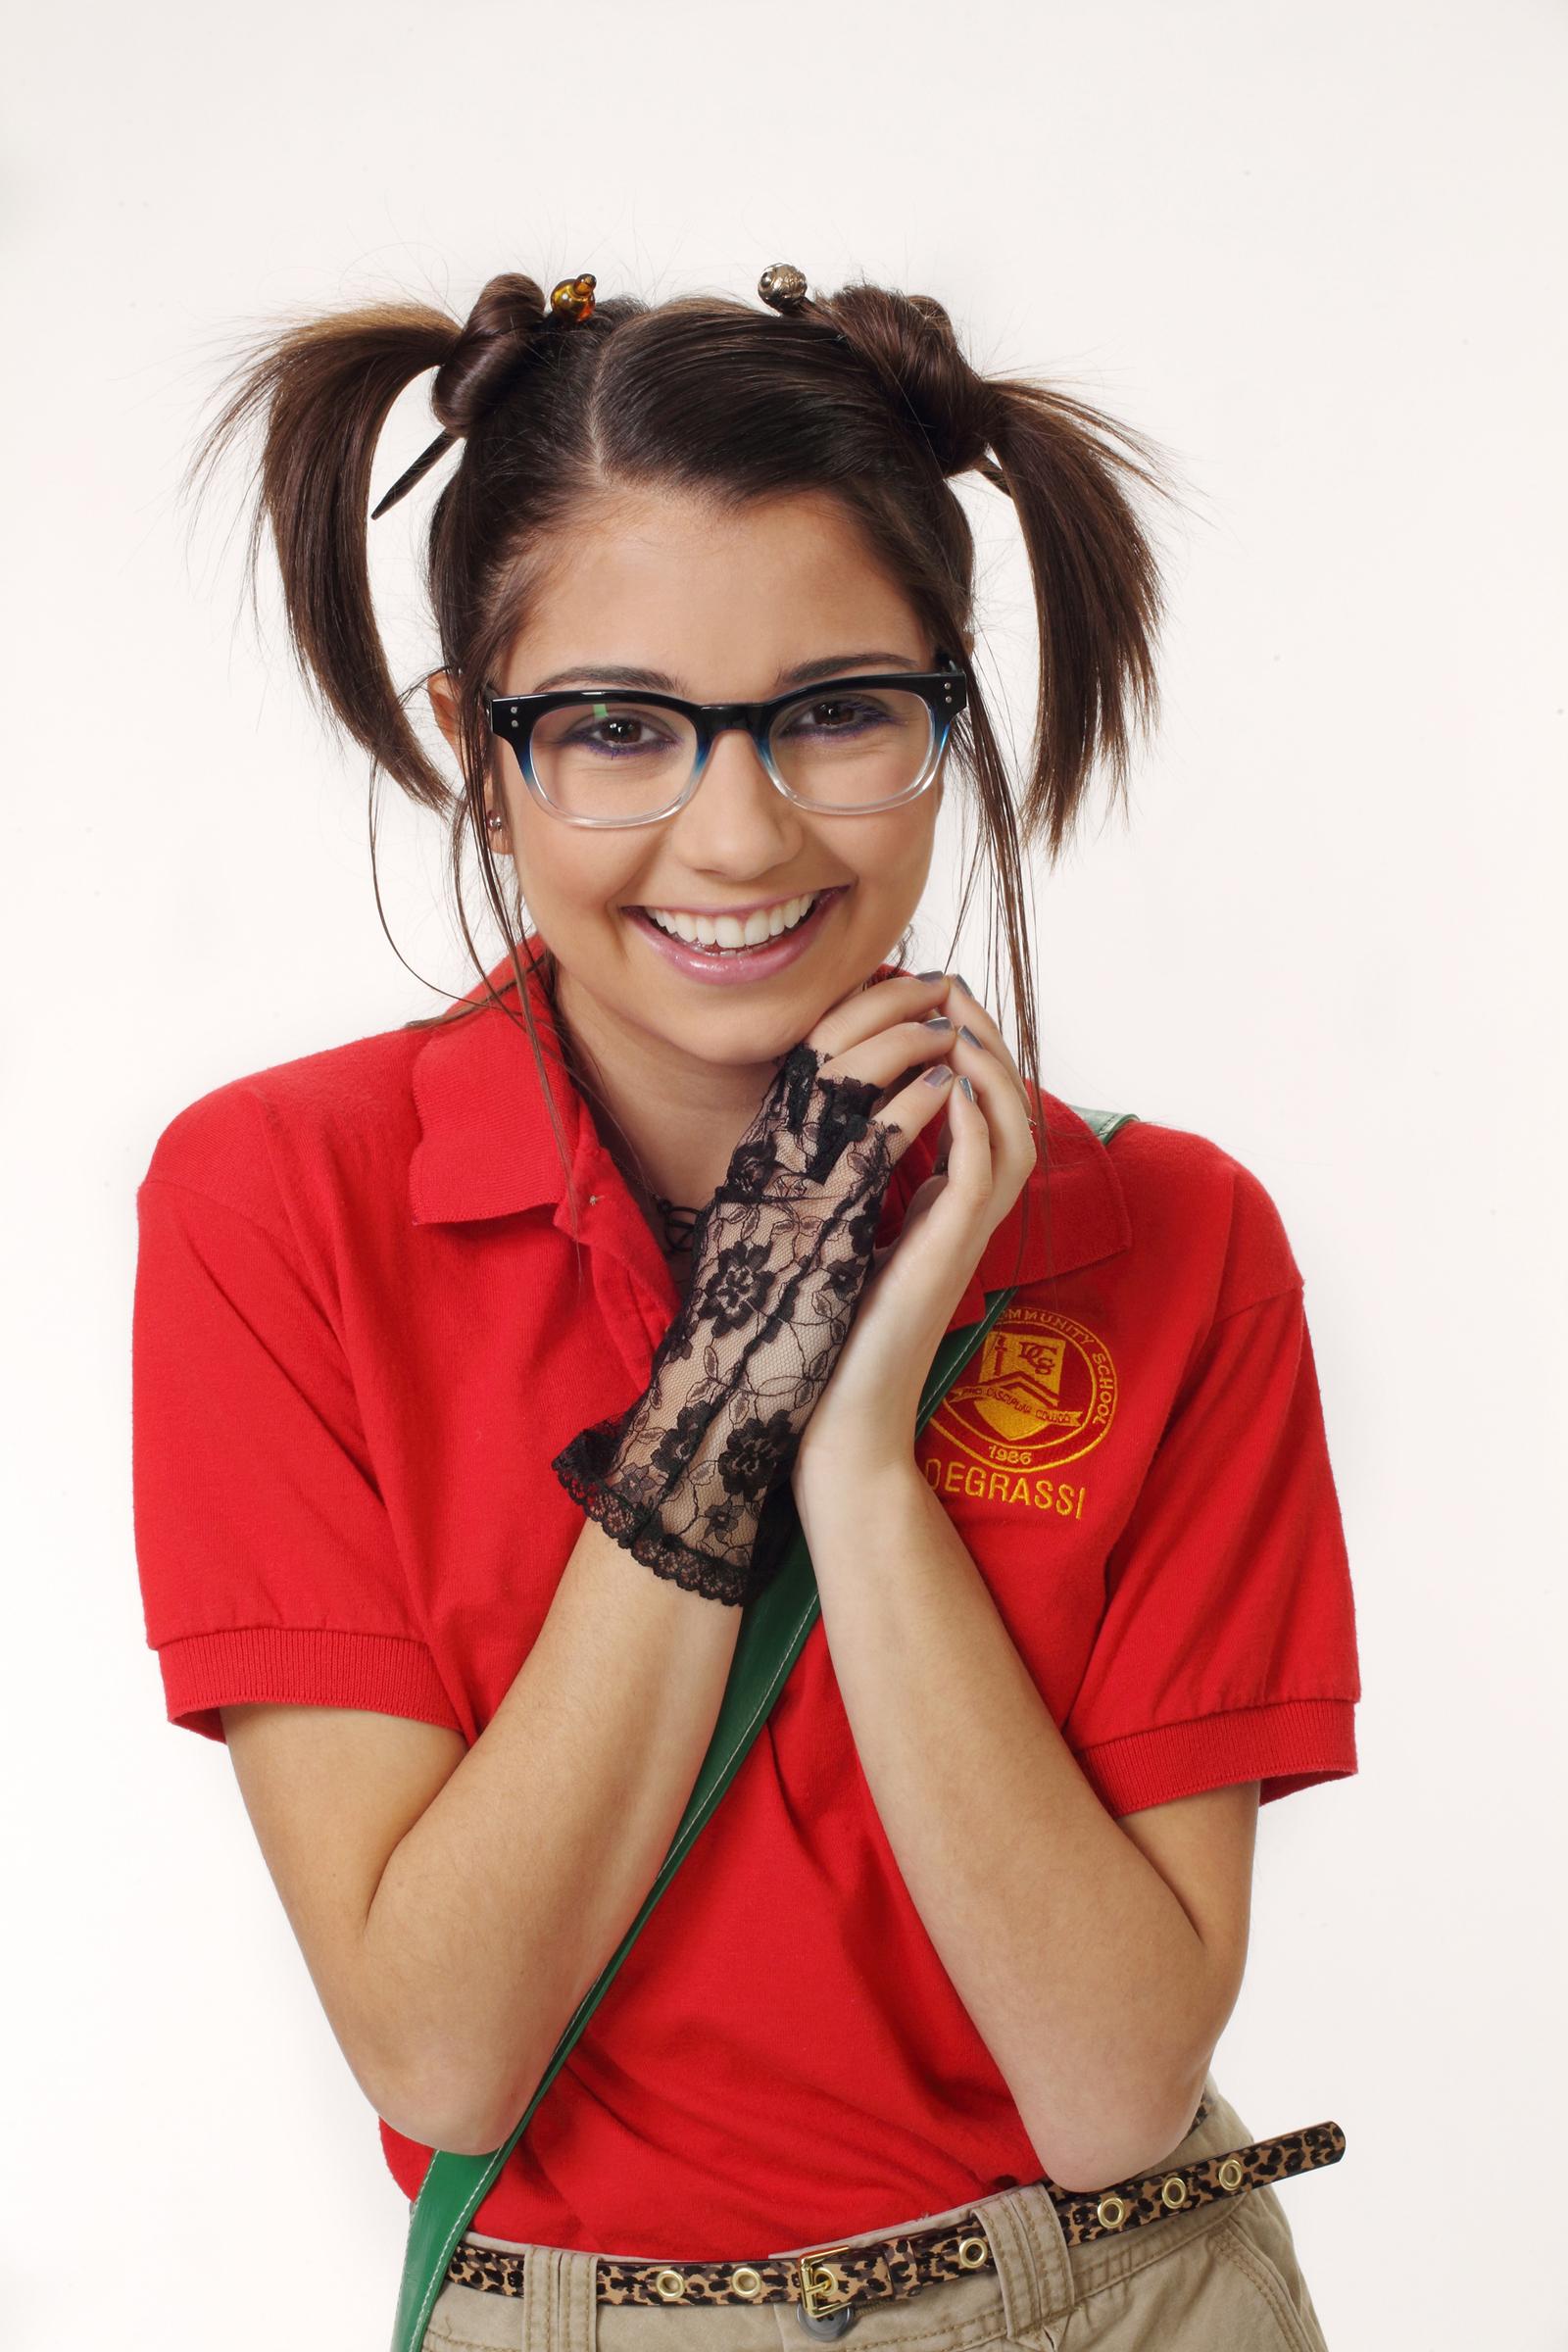 Sensational Degrassi Season 11 Hq Promotional Pics Individual Shots Kary39S Hairstyles For Women Draintrainus